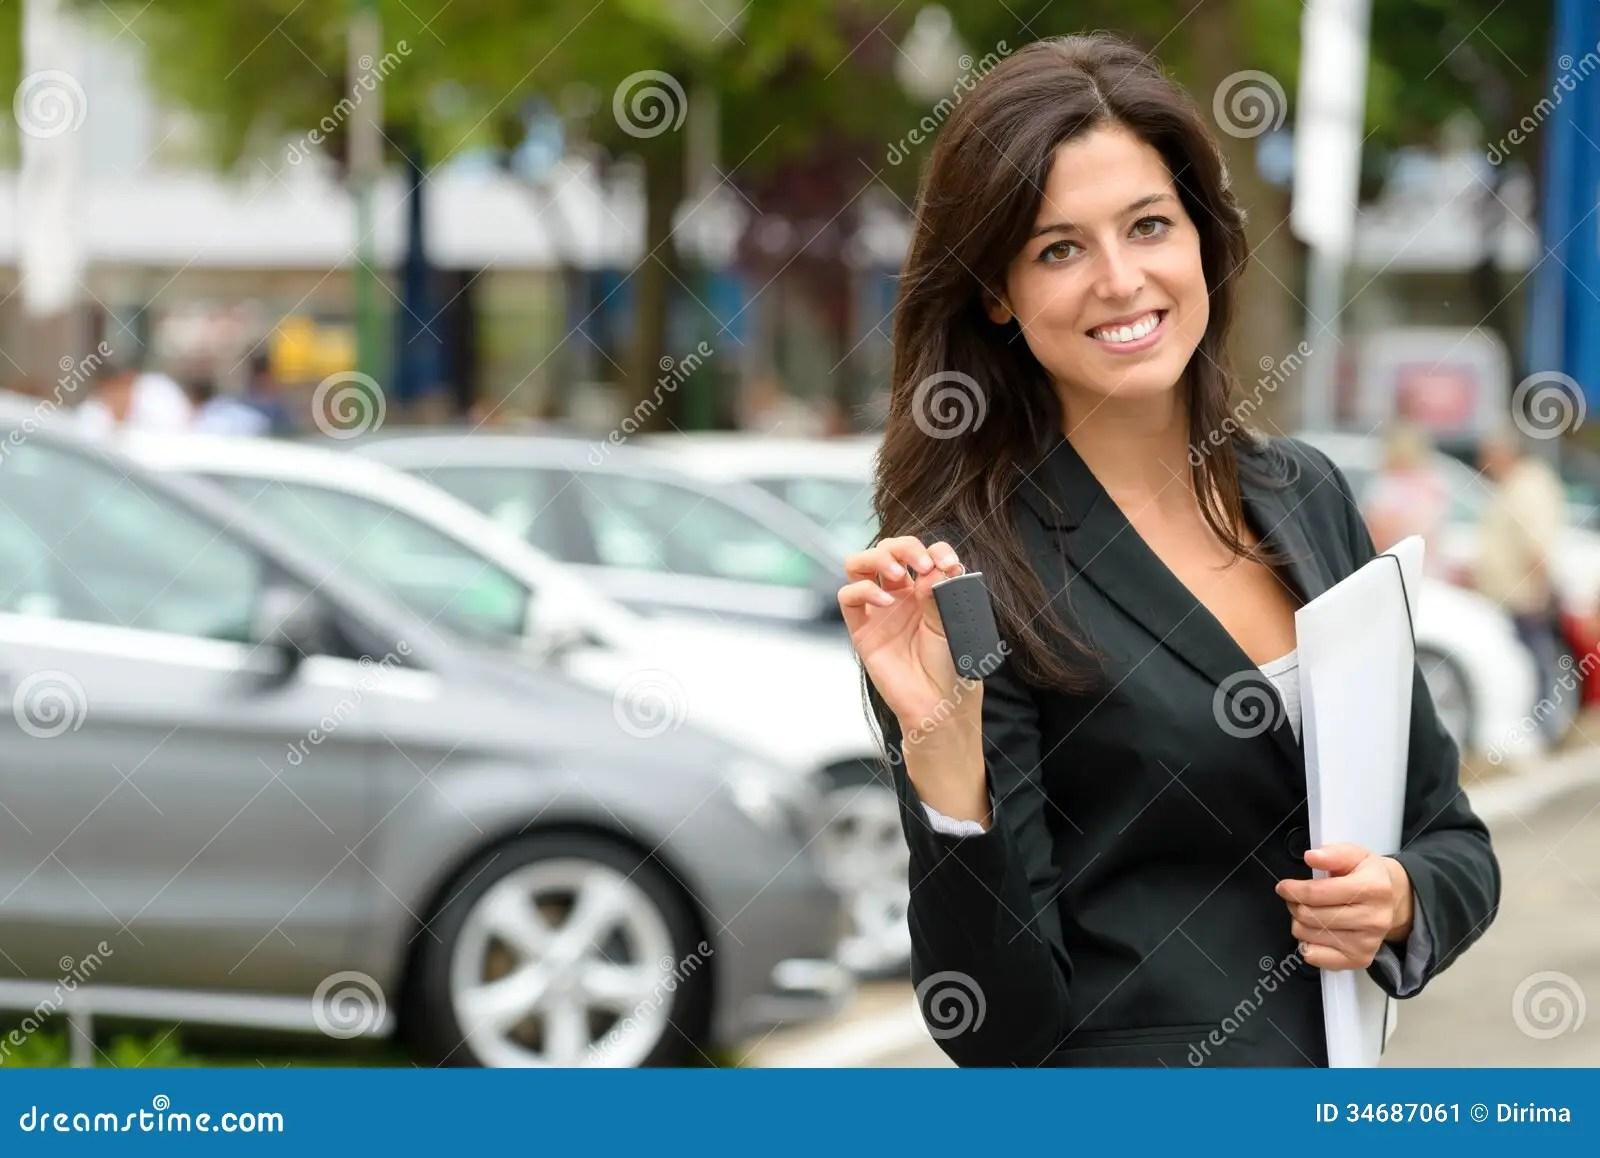 car sales woman stock